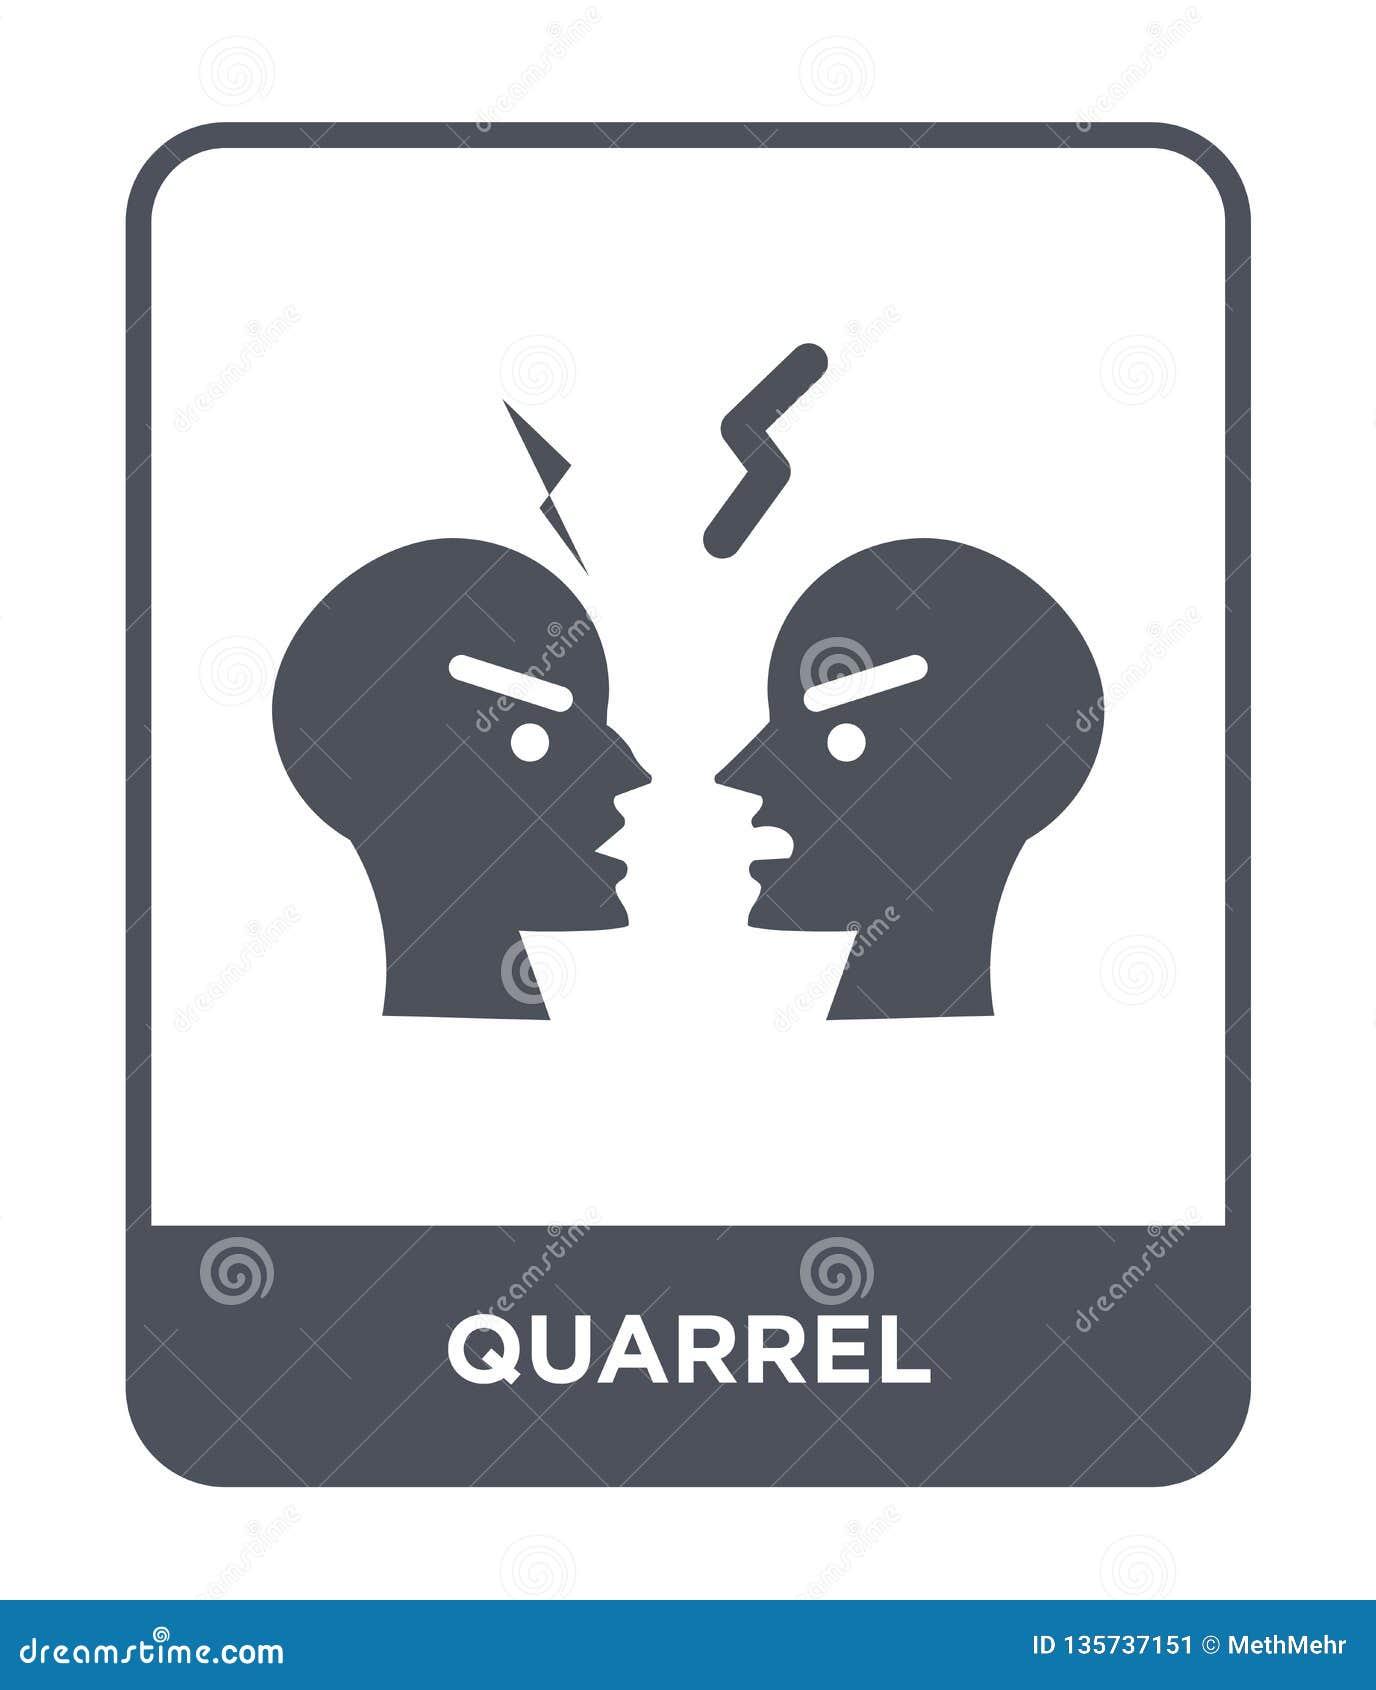 quarrel icon in trendy design style. quarrel icon isolated on white background. quarrel vector icon simple and modern flat symbol